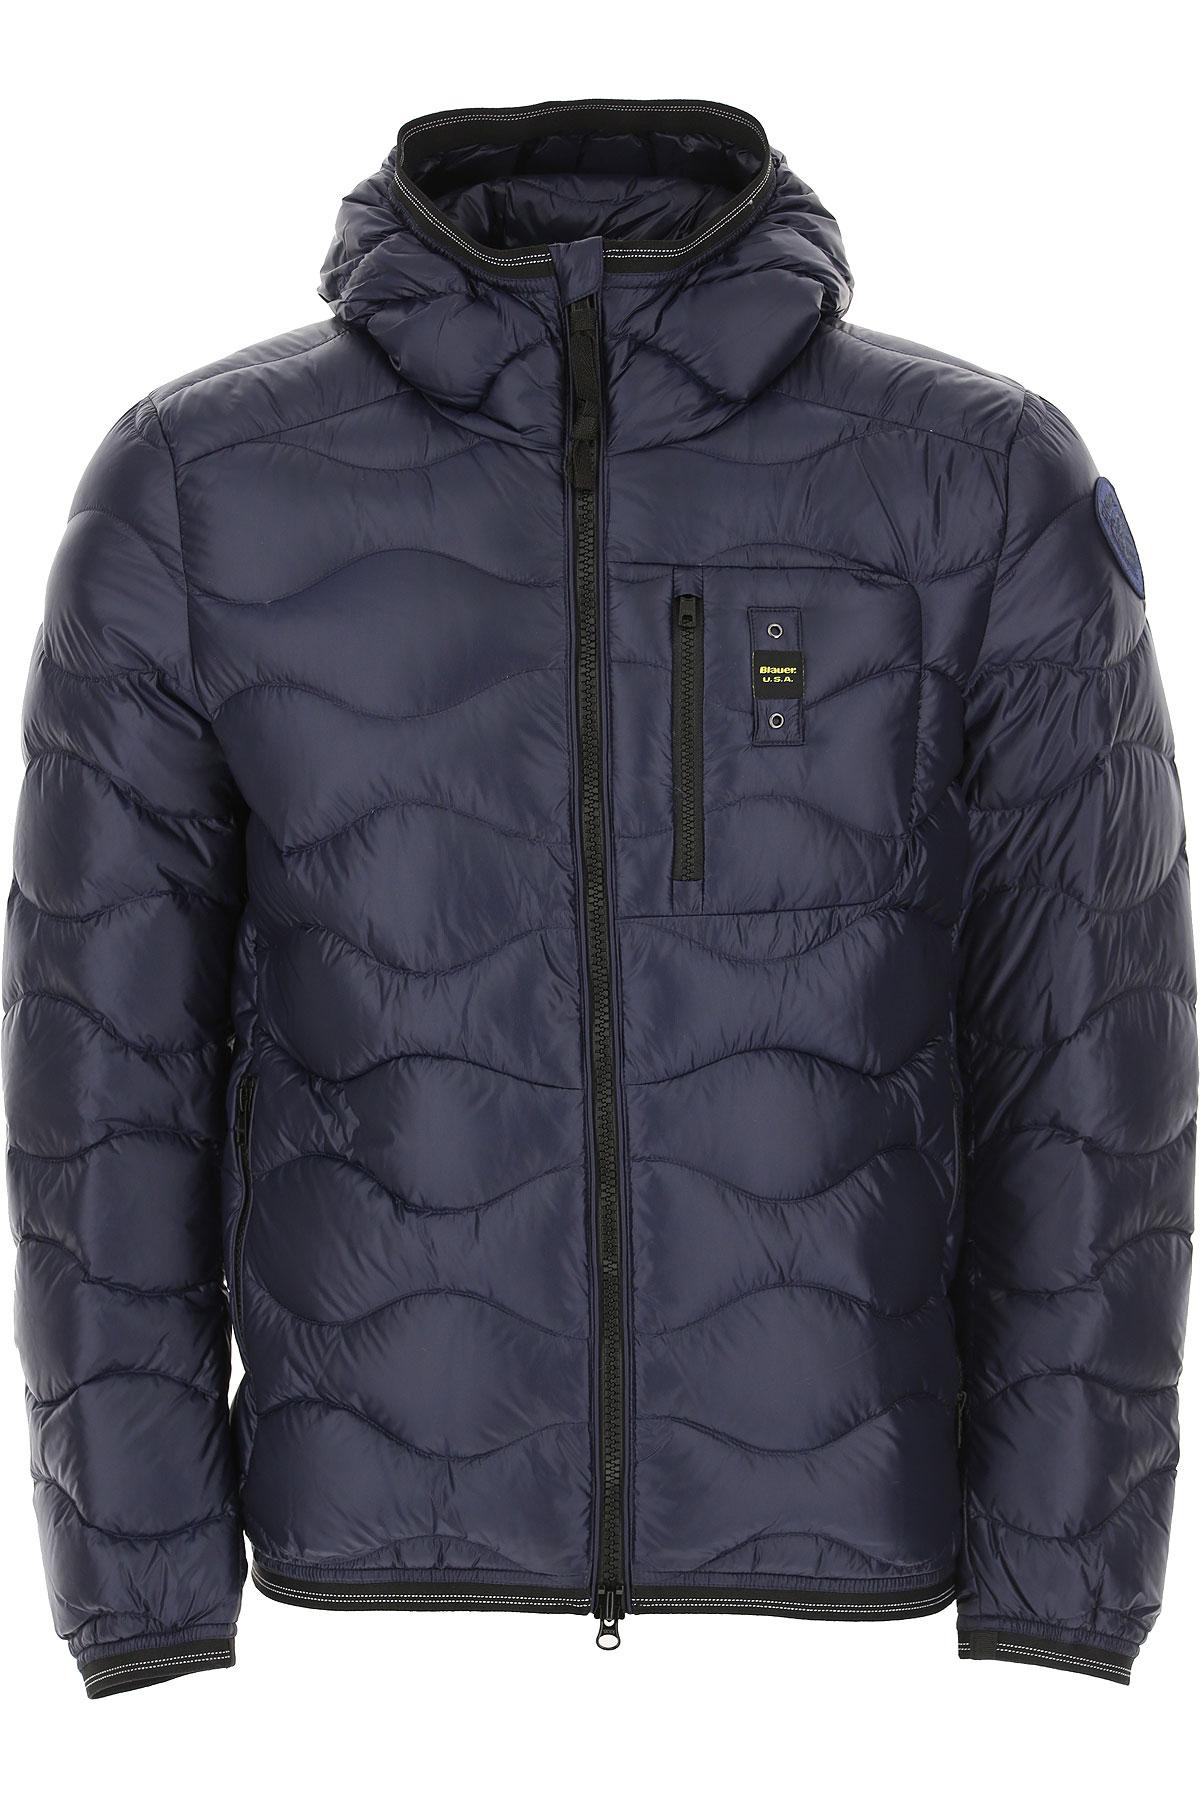 Blauer Down Jacket for Men, Puffer Ski Jacket On Sale, Night Blue, polyamide, 2019, L M S XL XXL